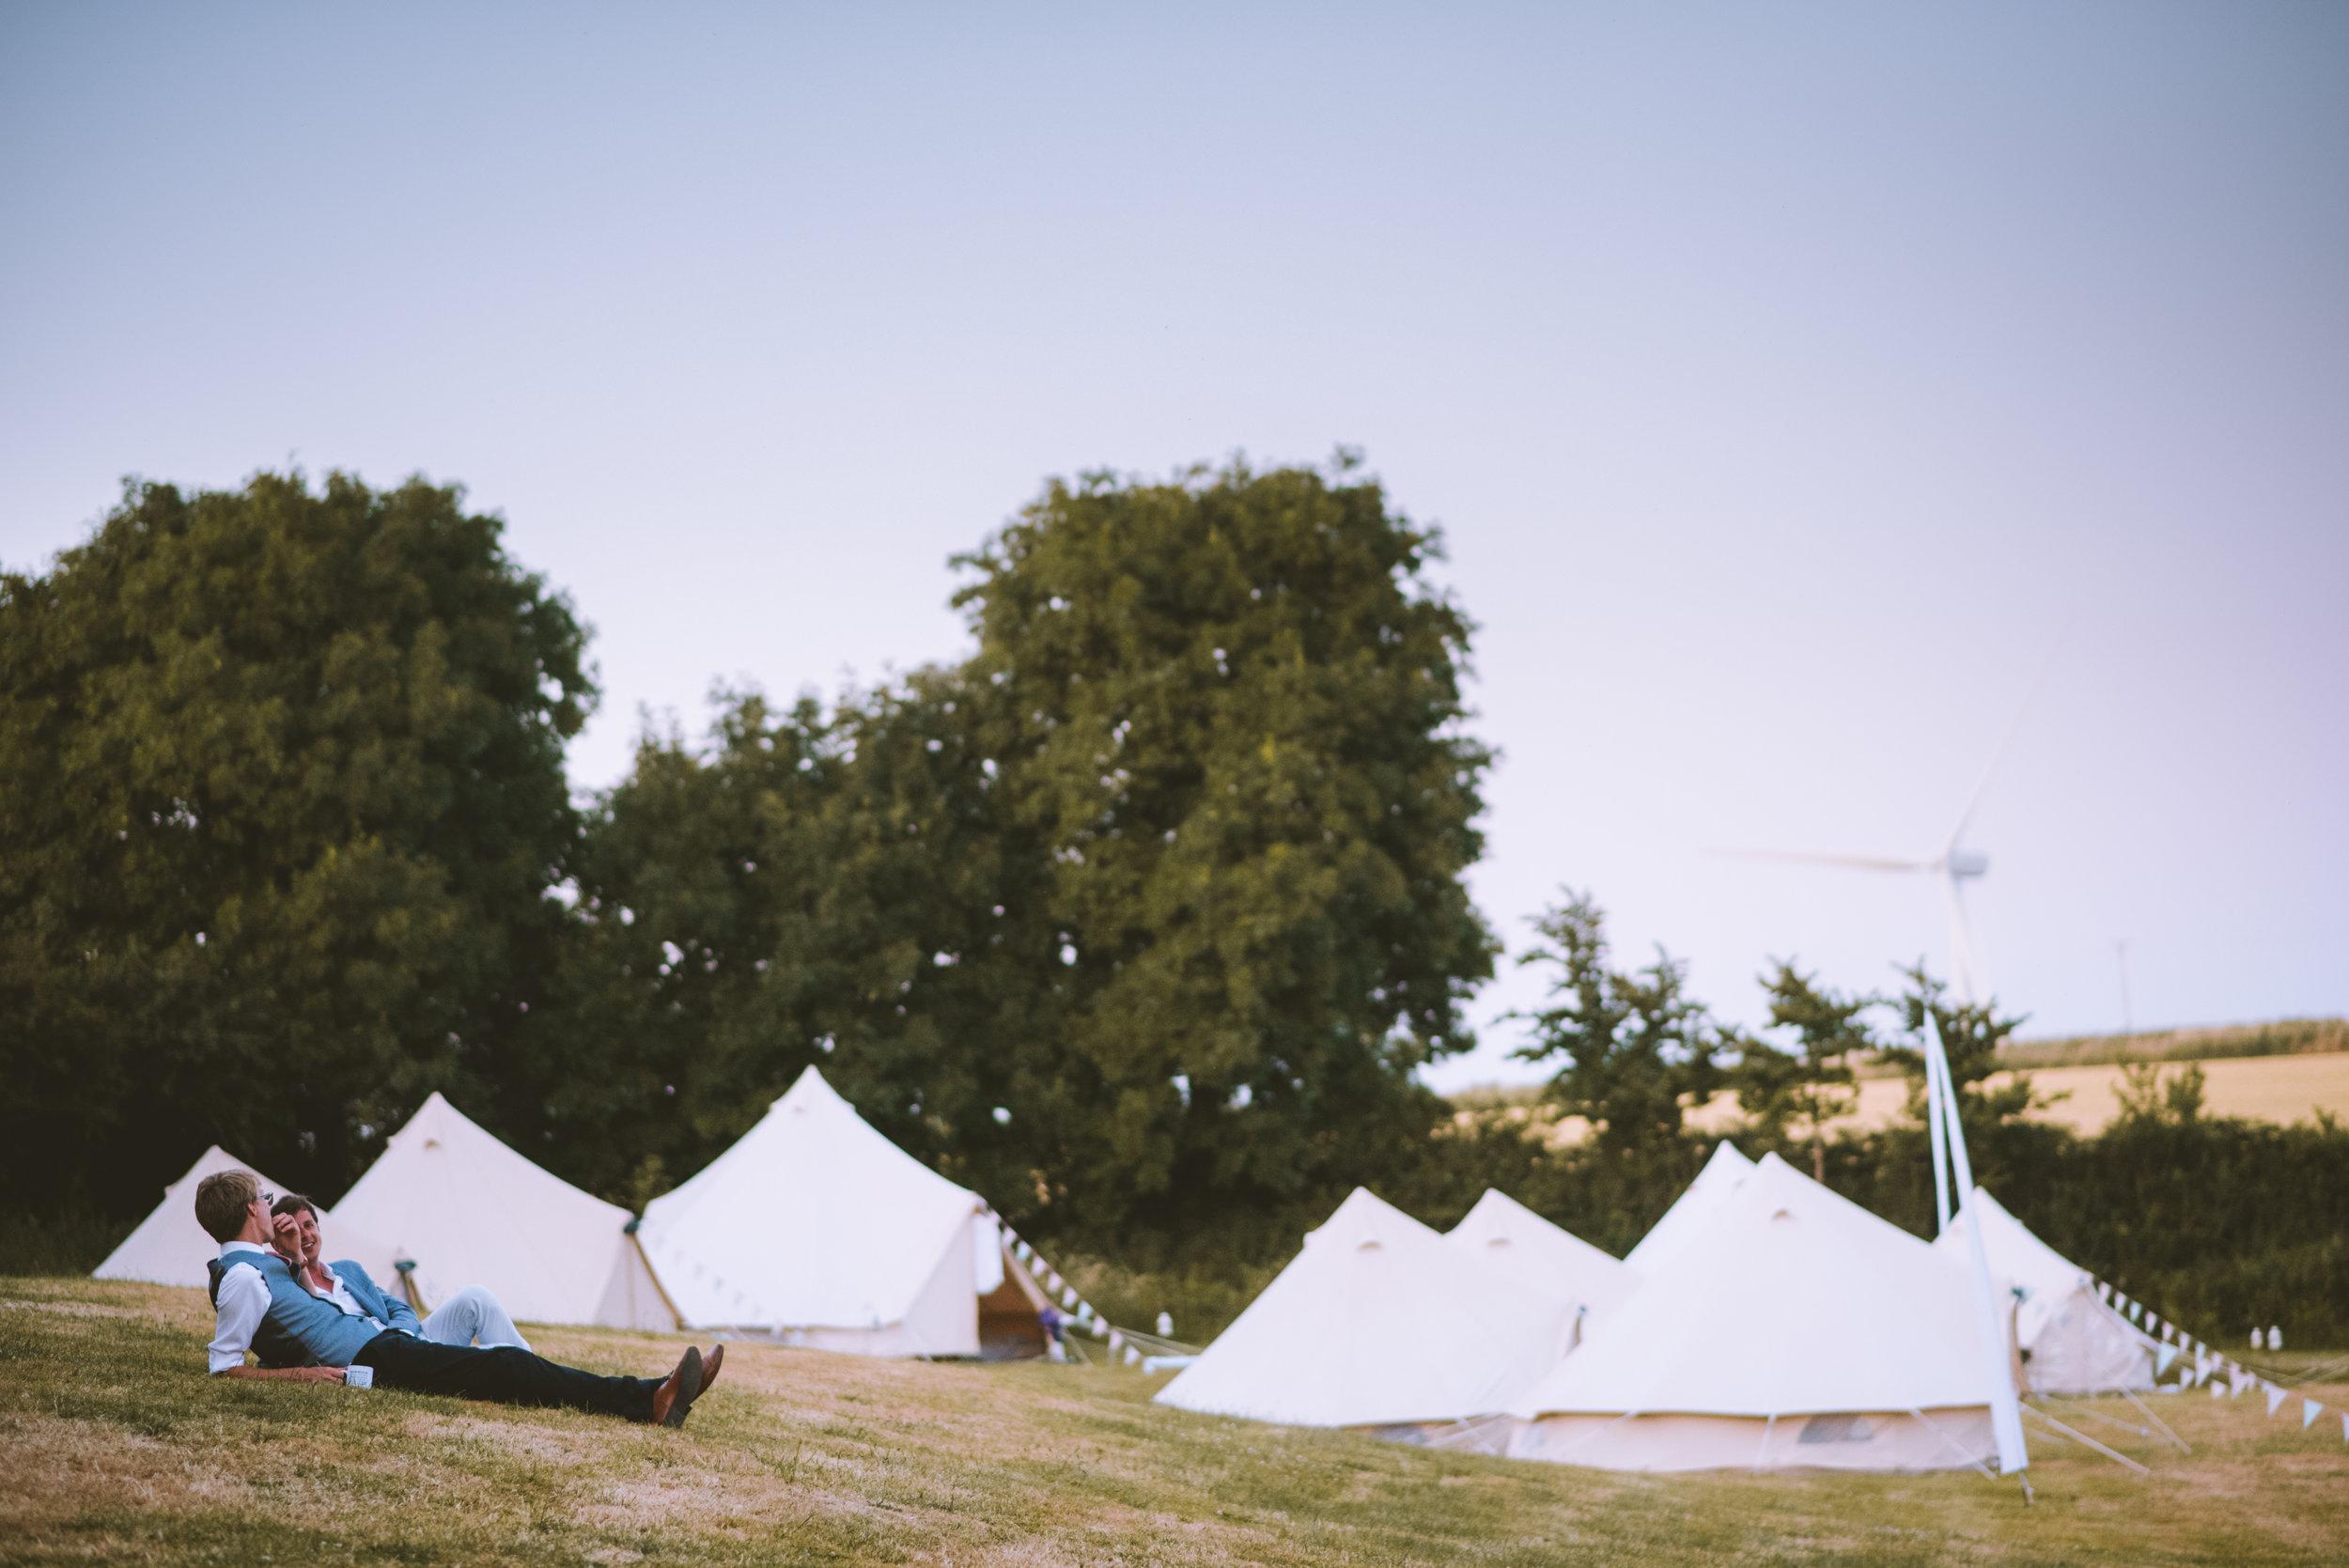 ashbarton-estate-wedding-photographer-mark-shaw-90.jpg